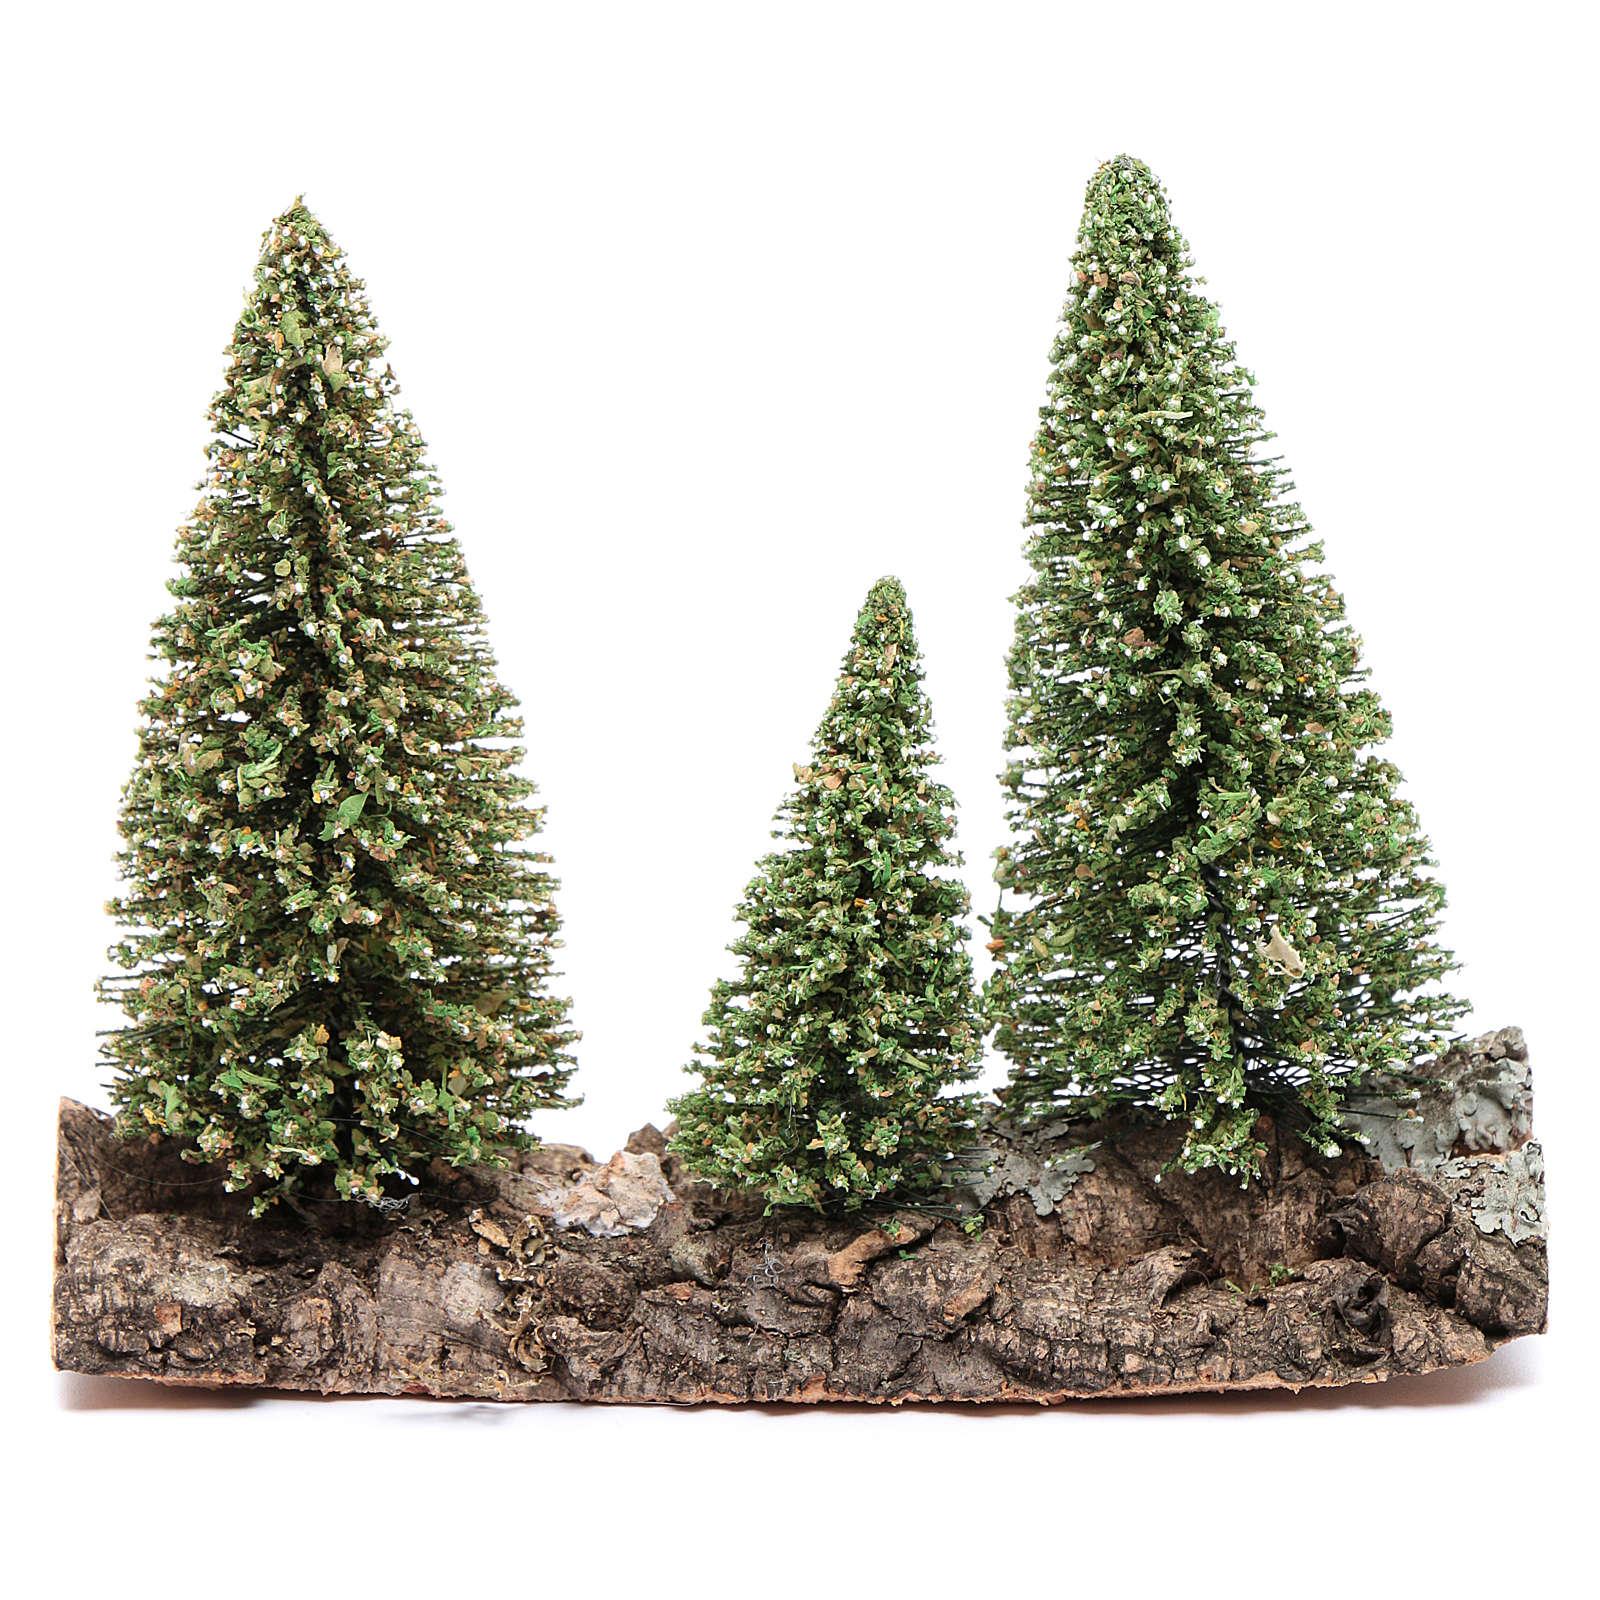 Nativity scene setting three pines on rock 4